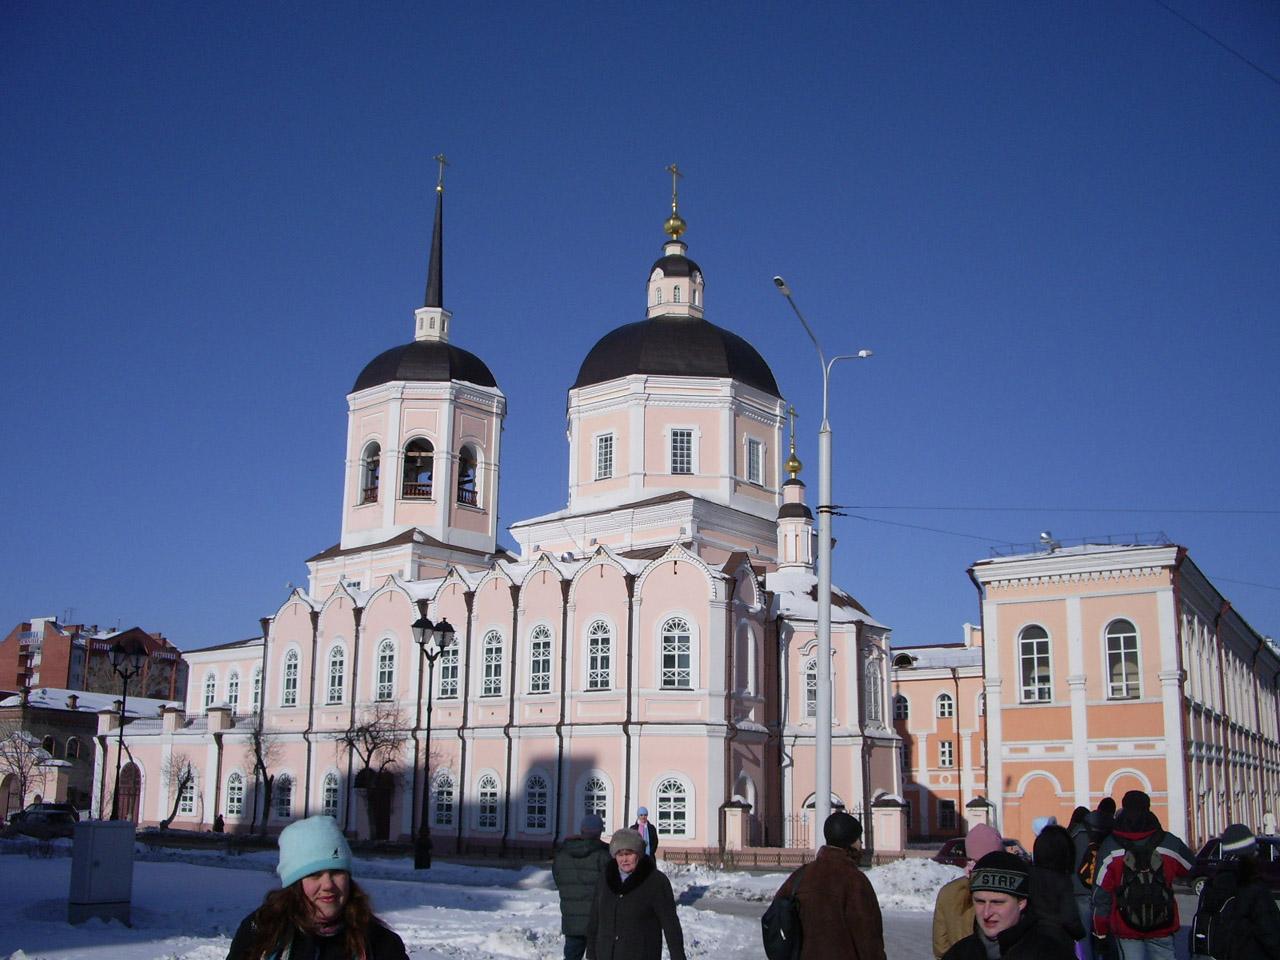 Tomszk